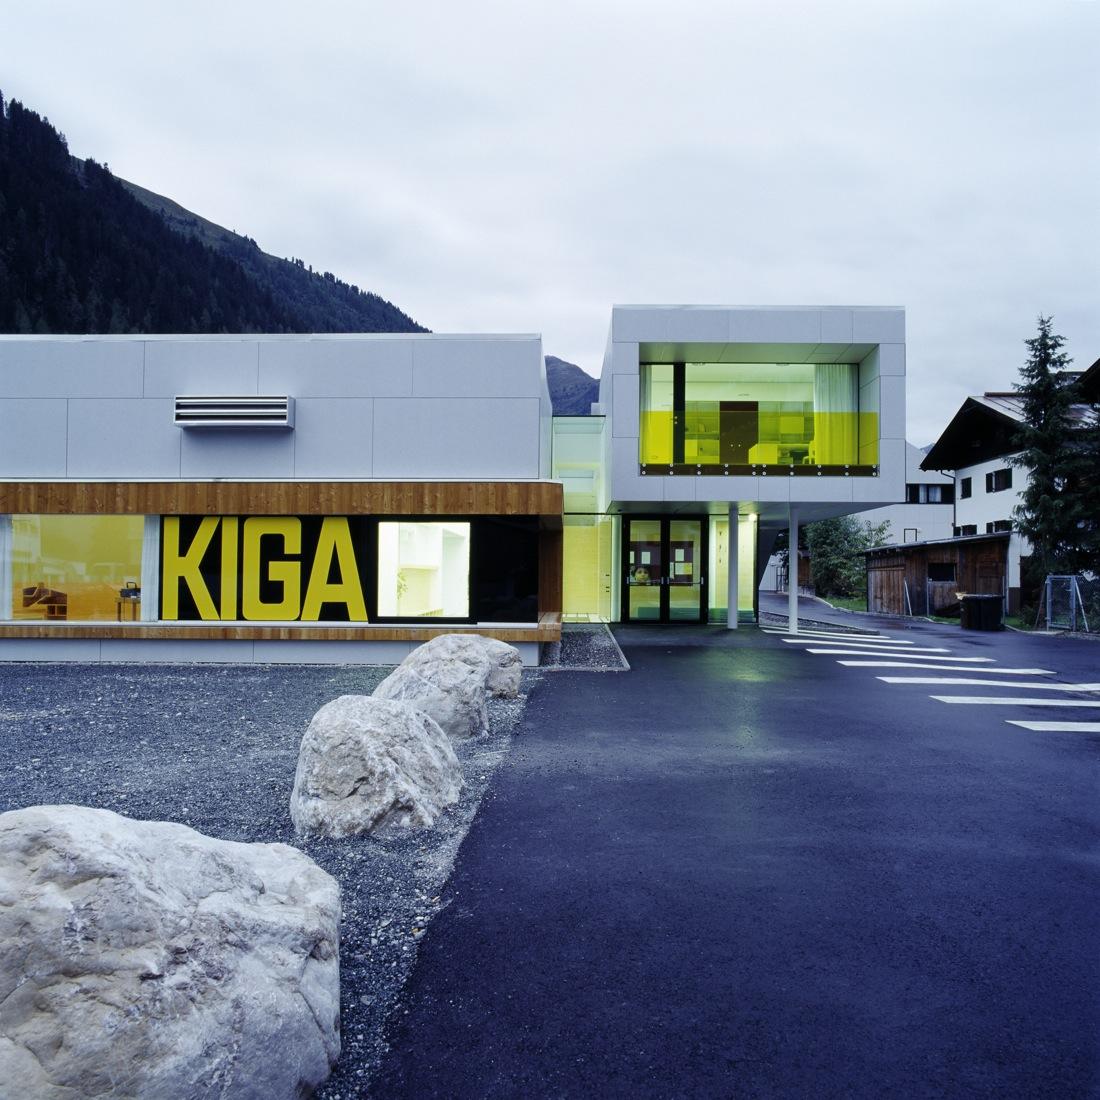 KIGA / AllesWirdGut Architektur, © Hertha Hurnaus & AllesWirdGut Architektur